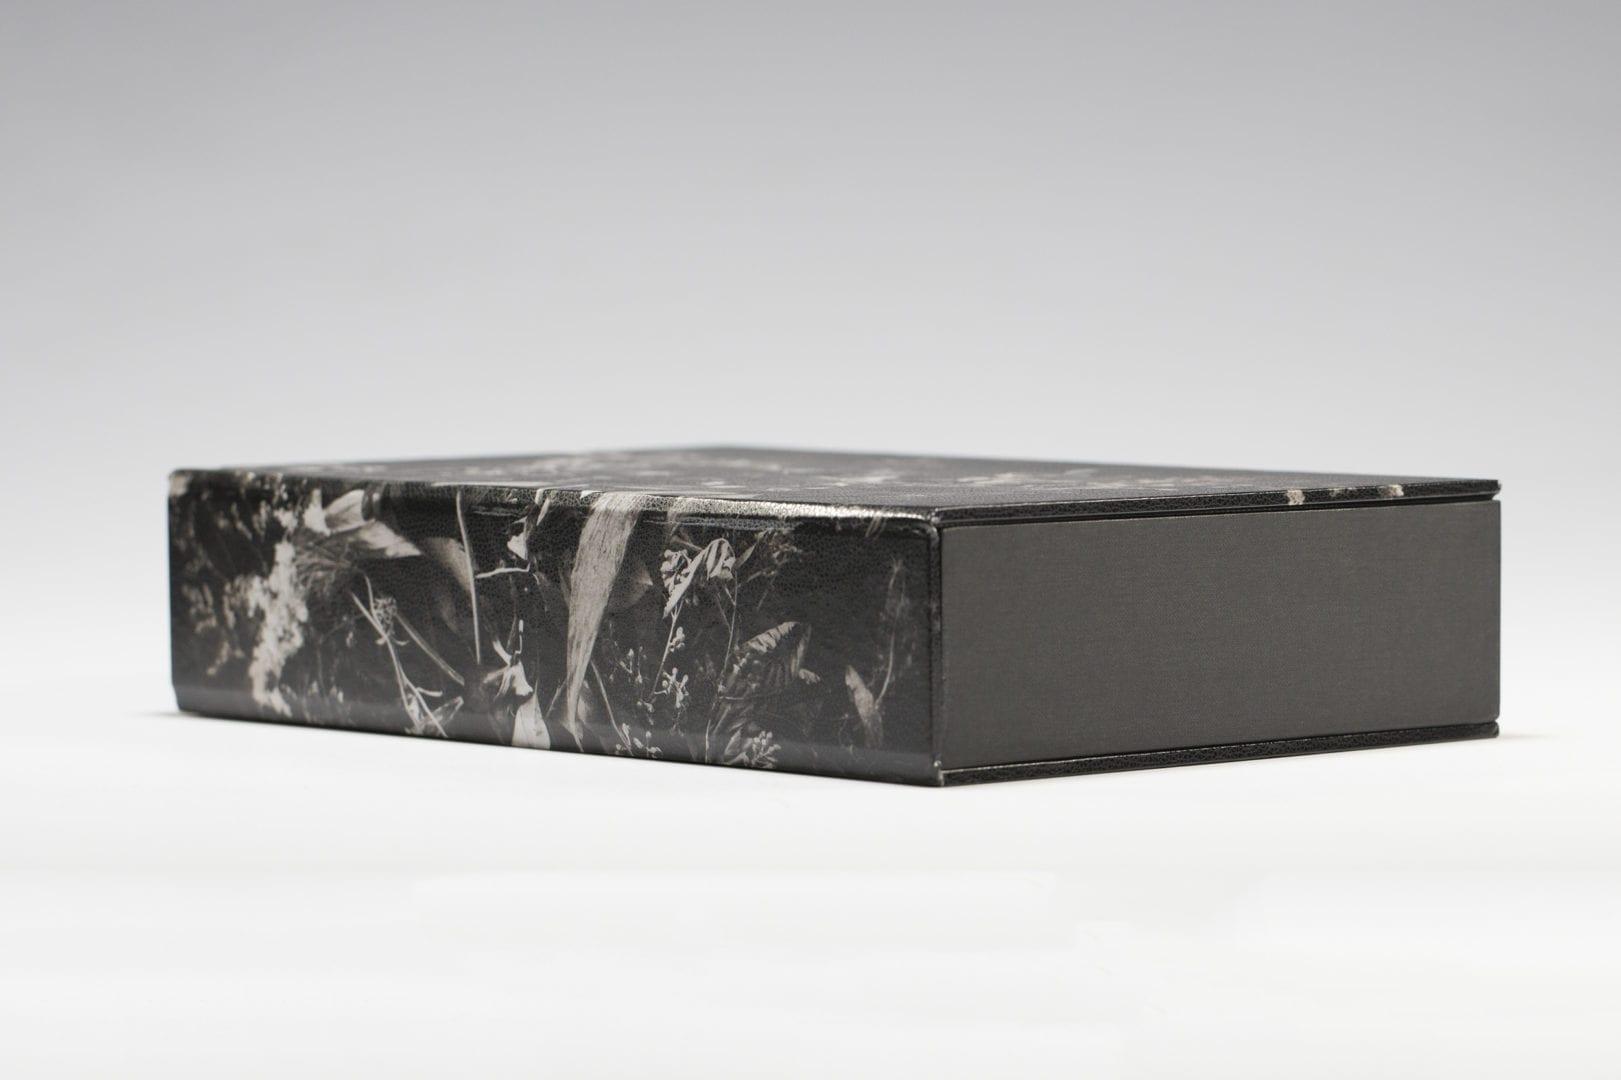 Joao Carlos, fineart, printing, joao carlos photography, deluxe box, print box